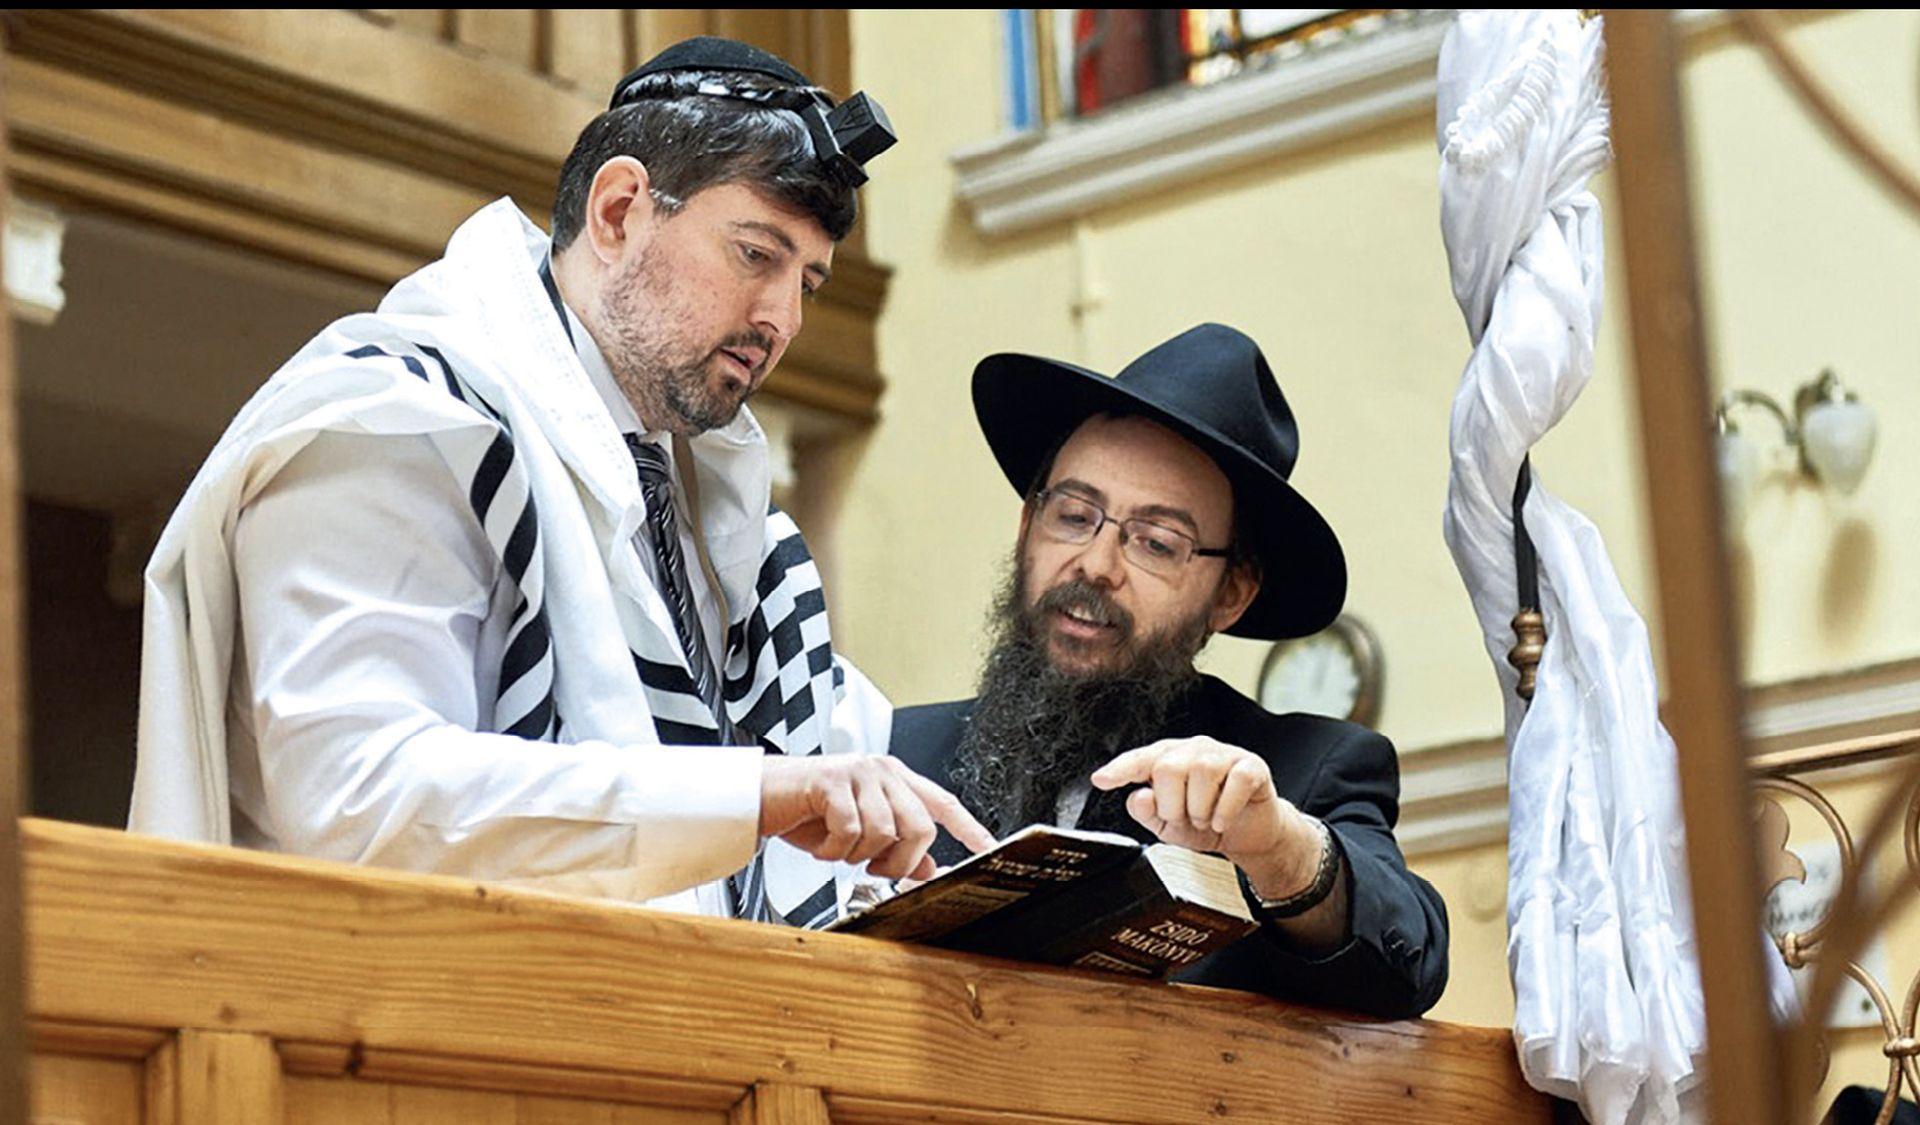 Kako je kruti antisemit postao ortodoksni židov